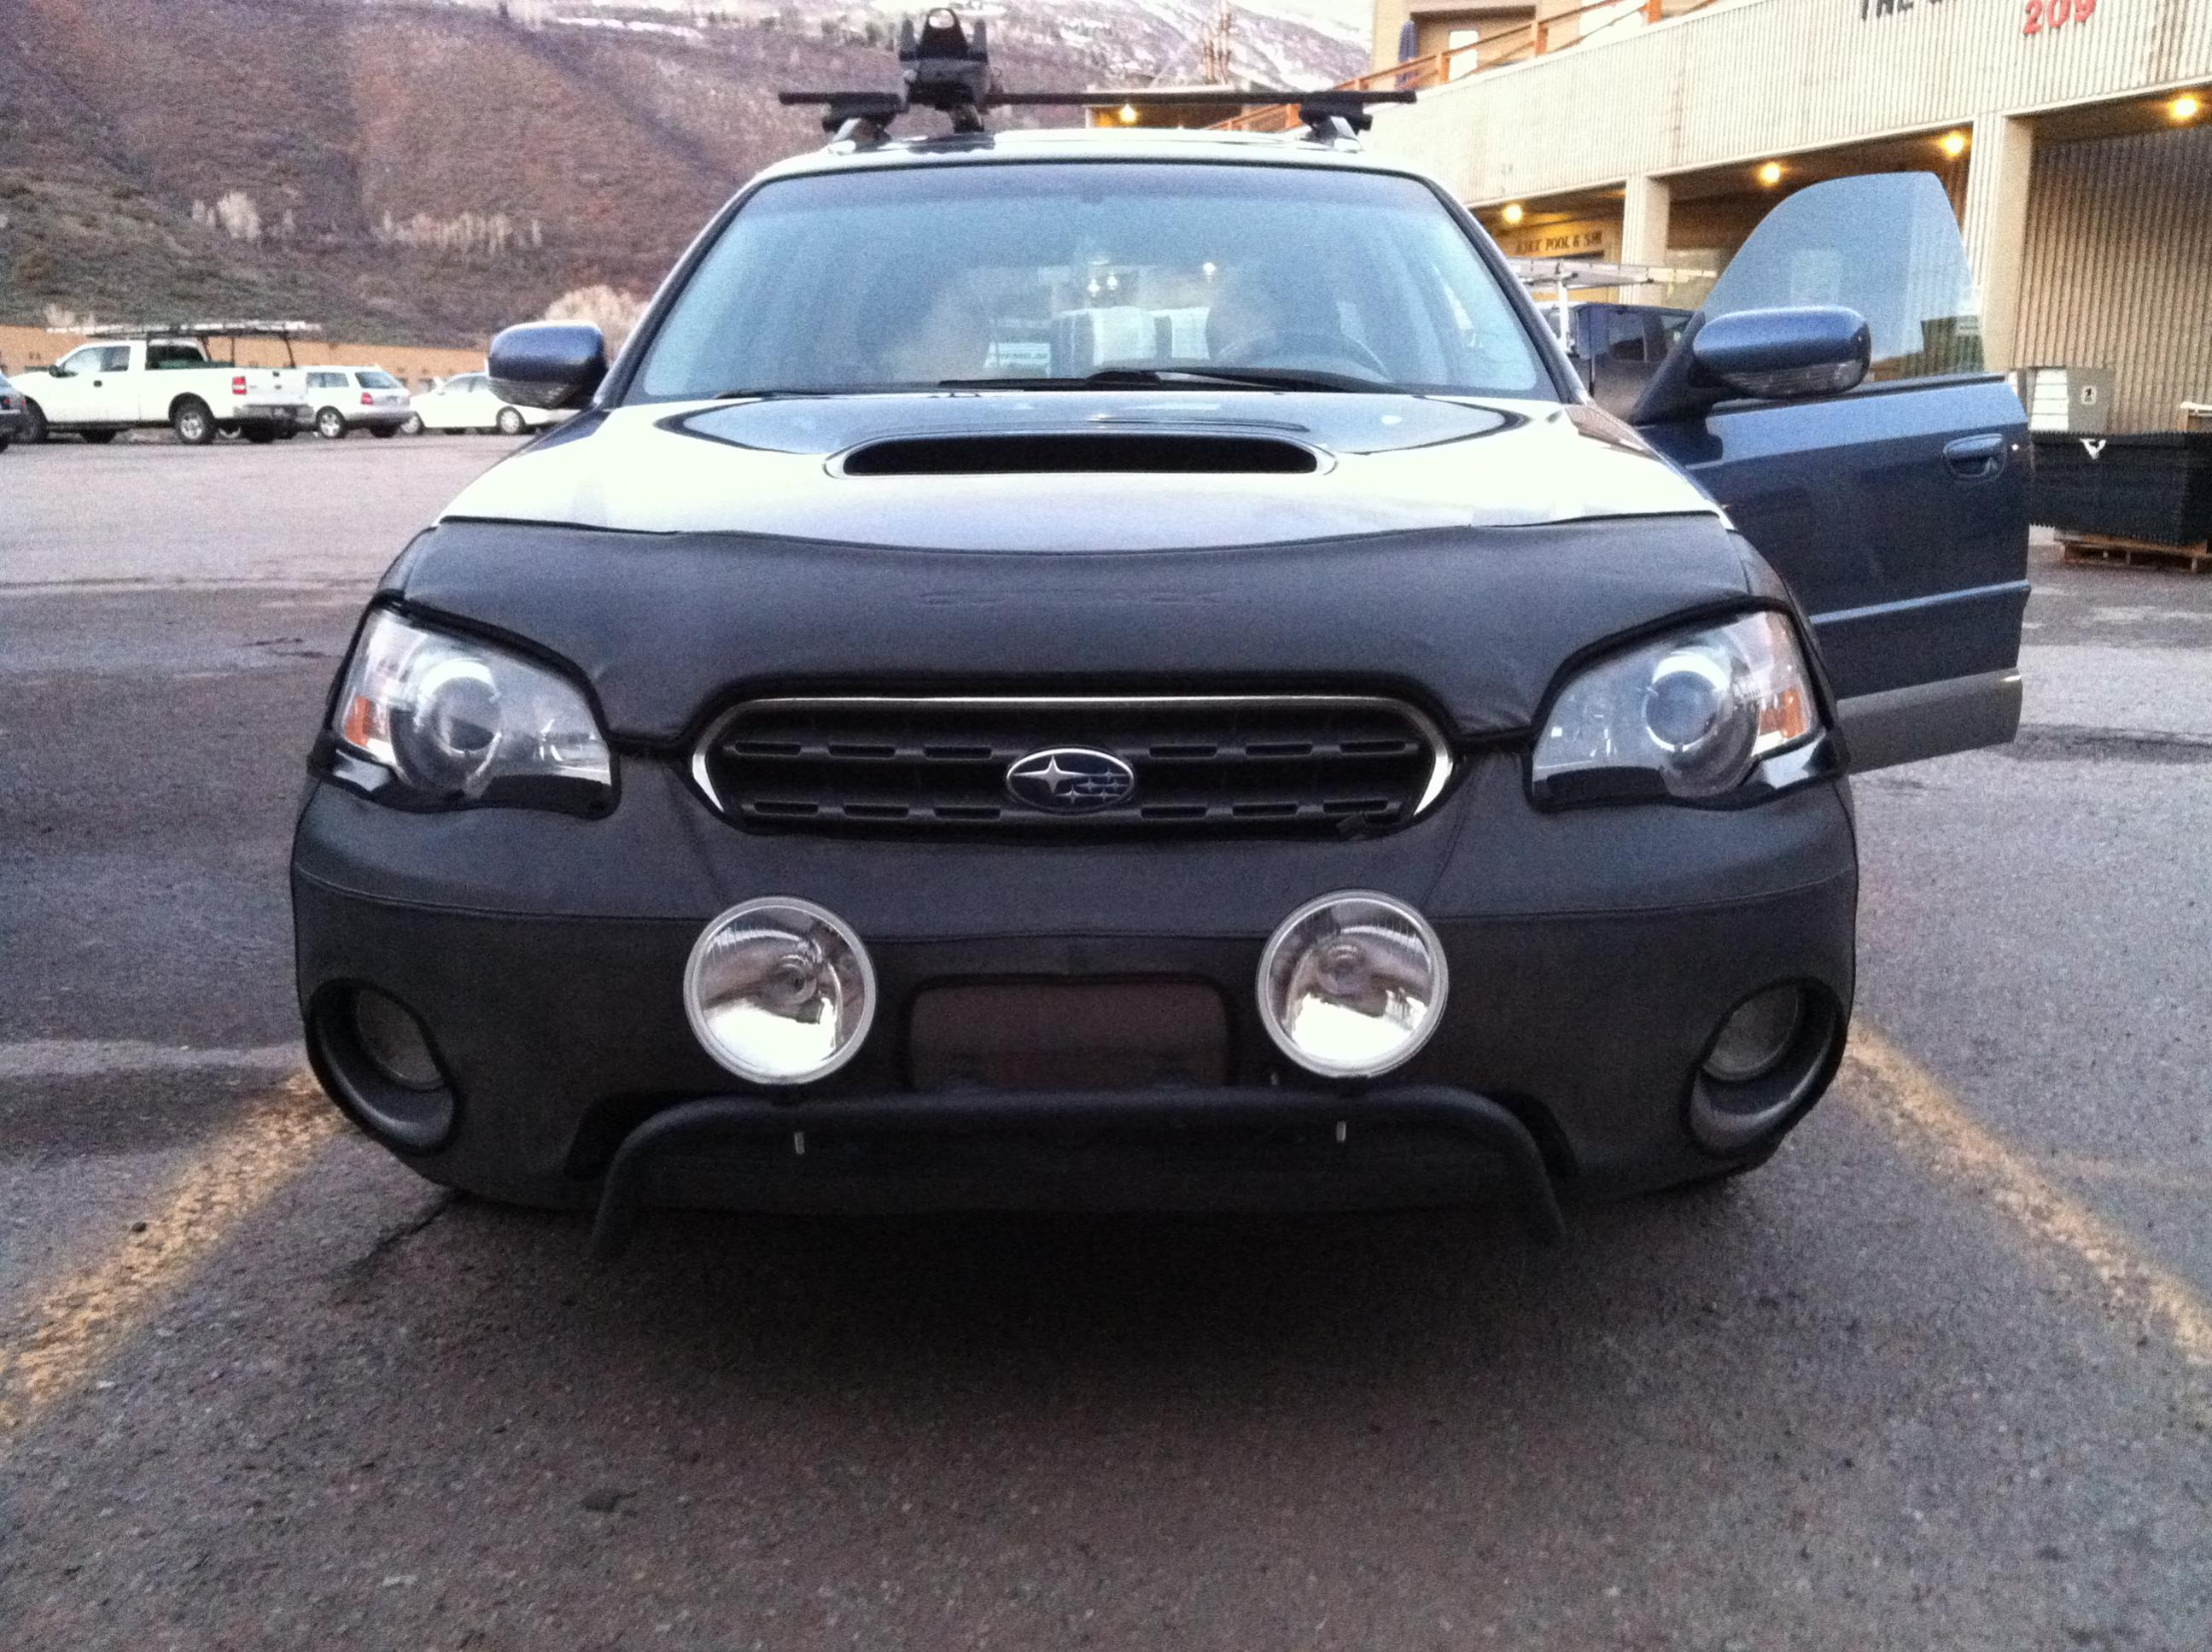 Hella 550 Fog Lights Wiring Diagram Light 500 Install Issues Subaru Outback